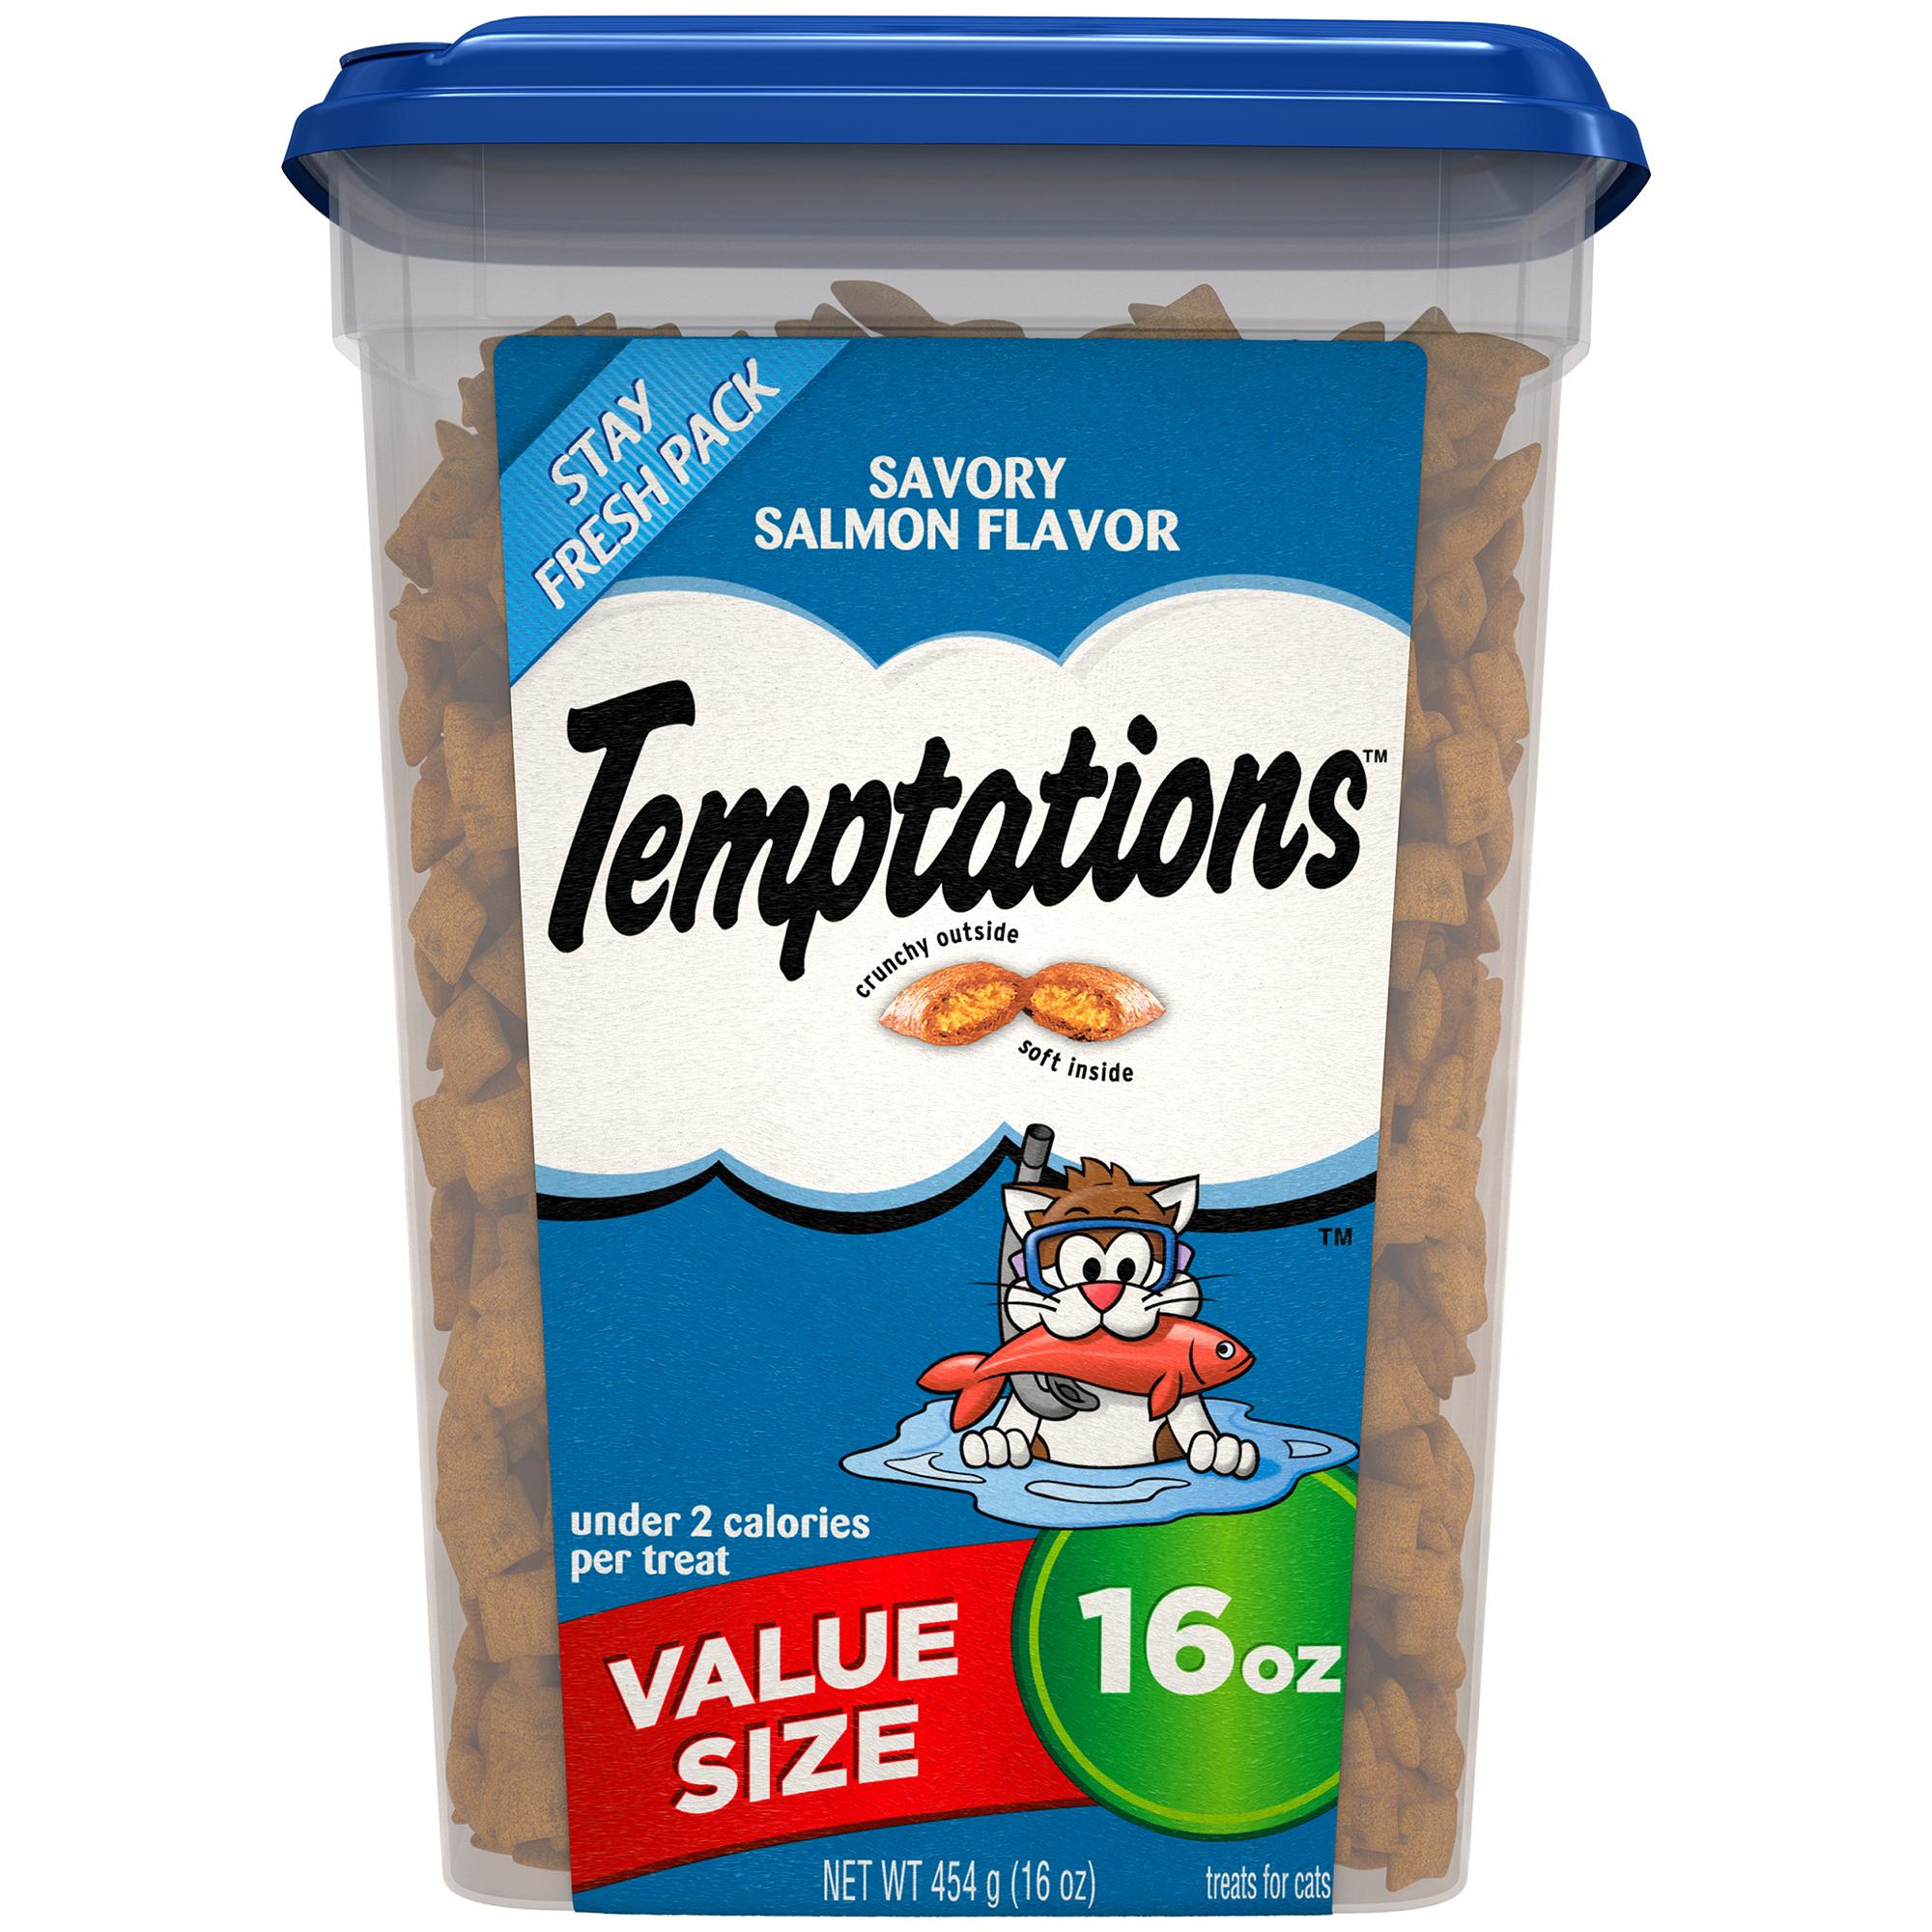 TEMPTATIONS Classic Treats for Cats Savory Salmon Flavor, 16 oz. Tub